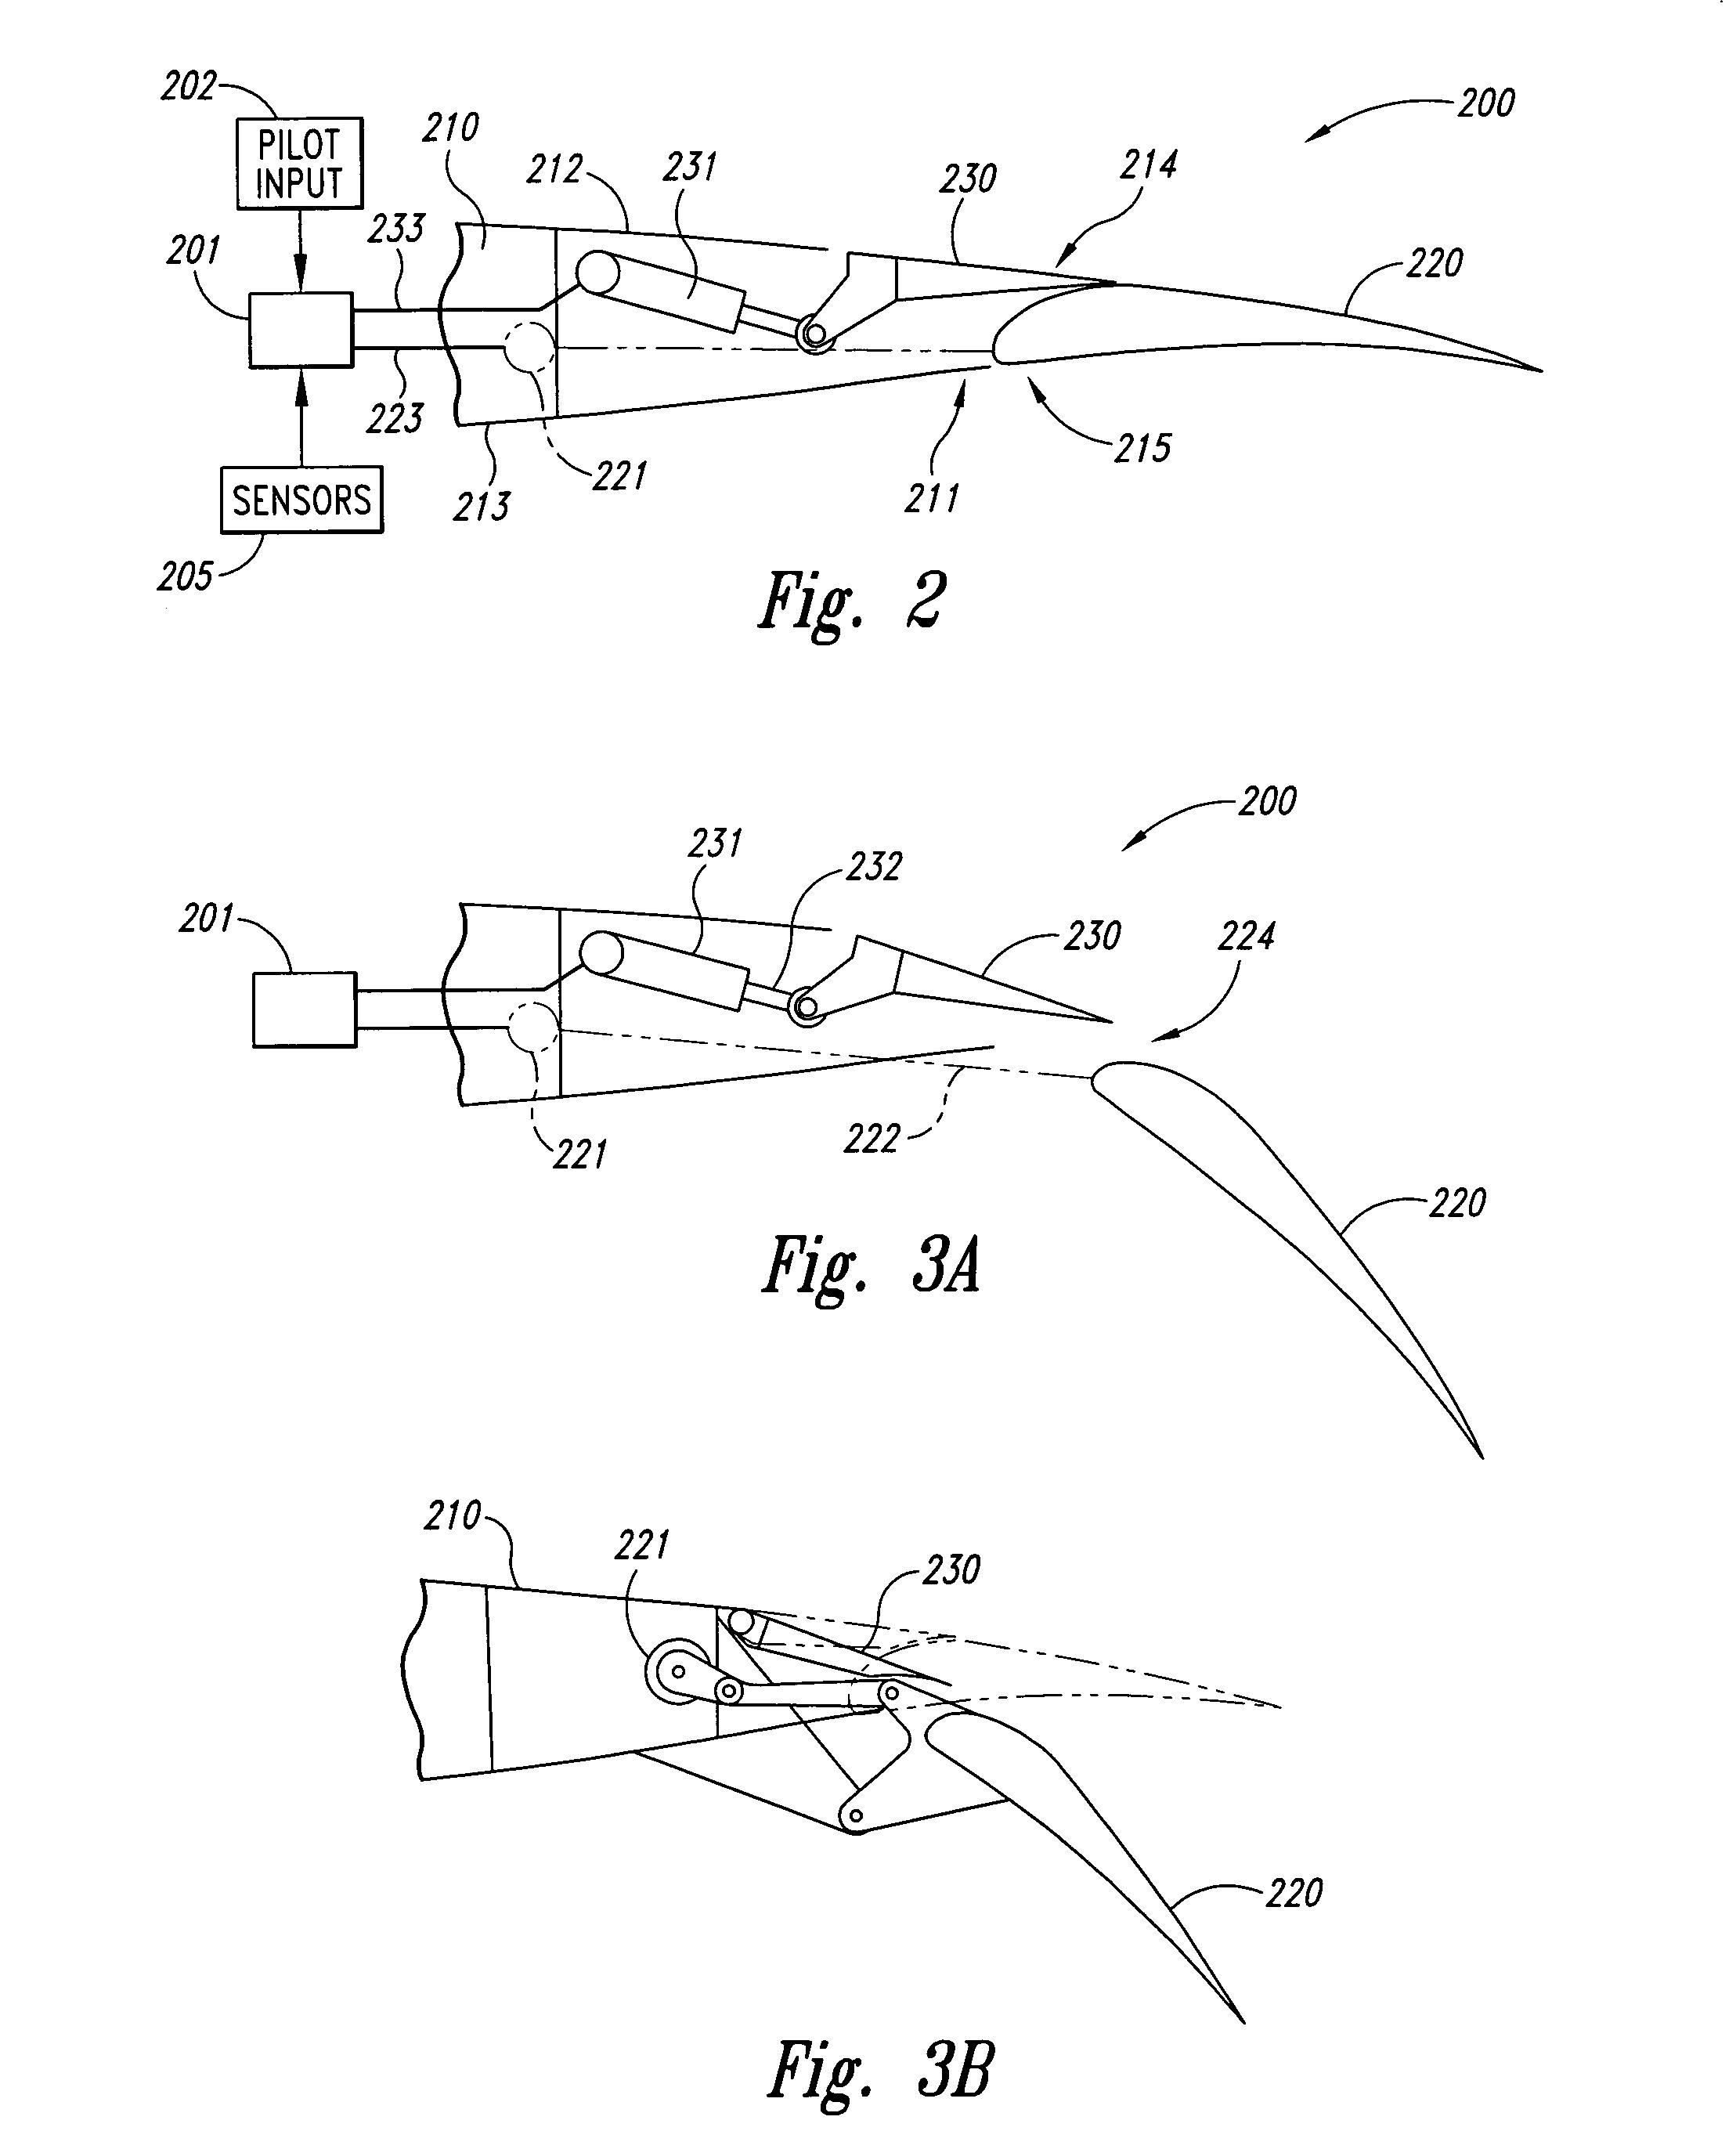 1950 John Deere B Wiring Diagram : John deere a wiring diagram get free image